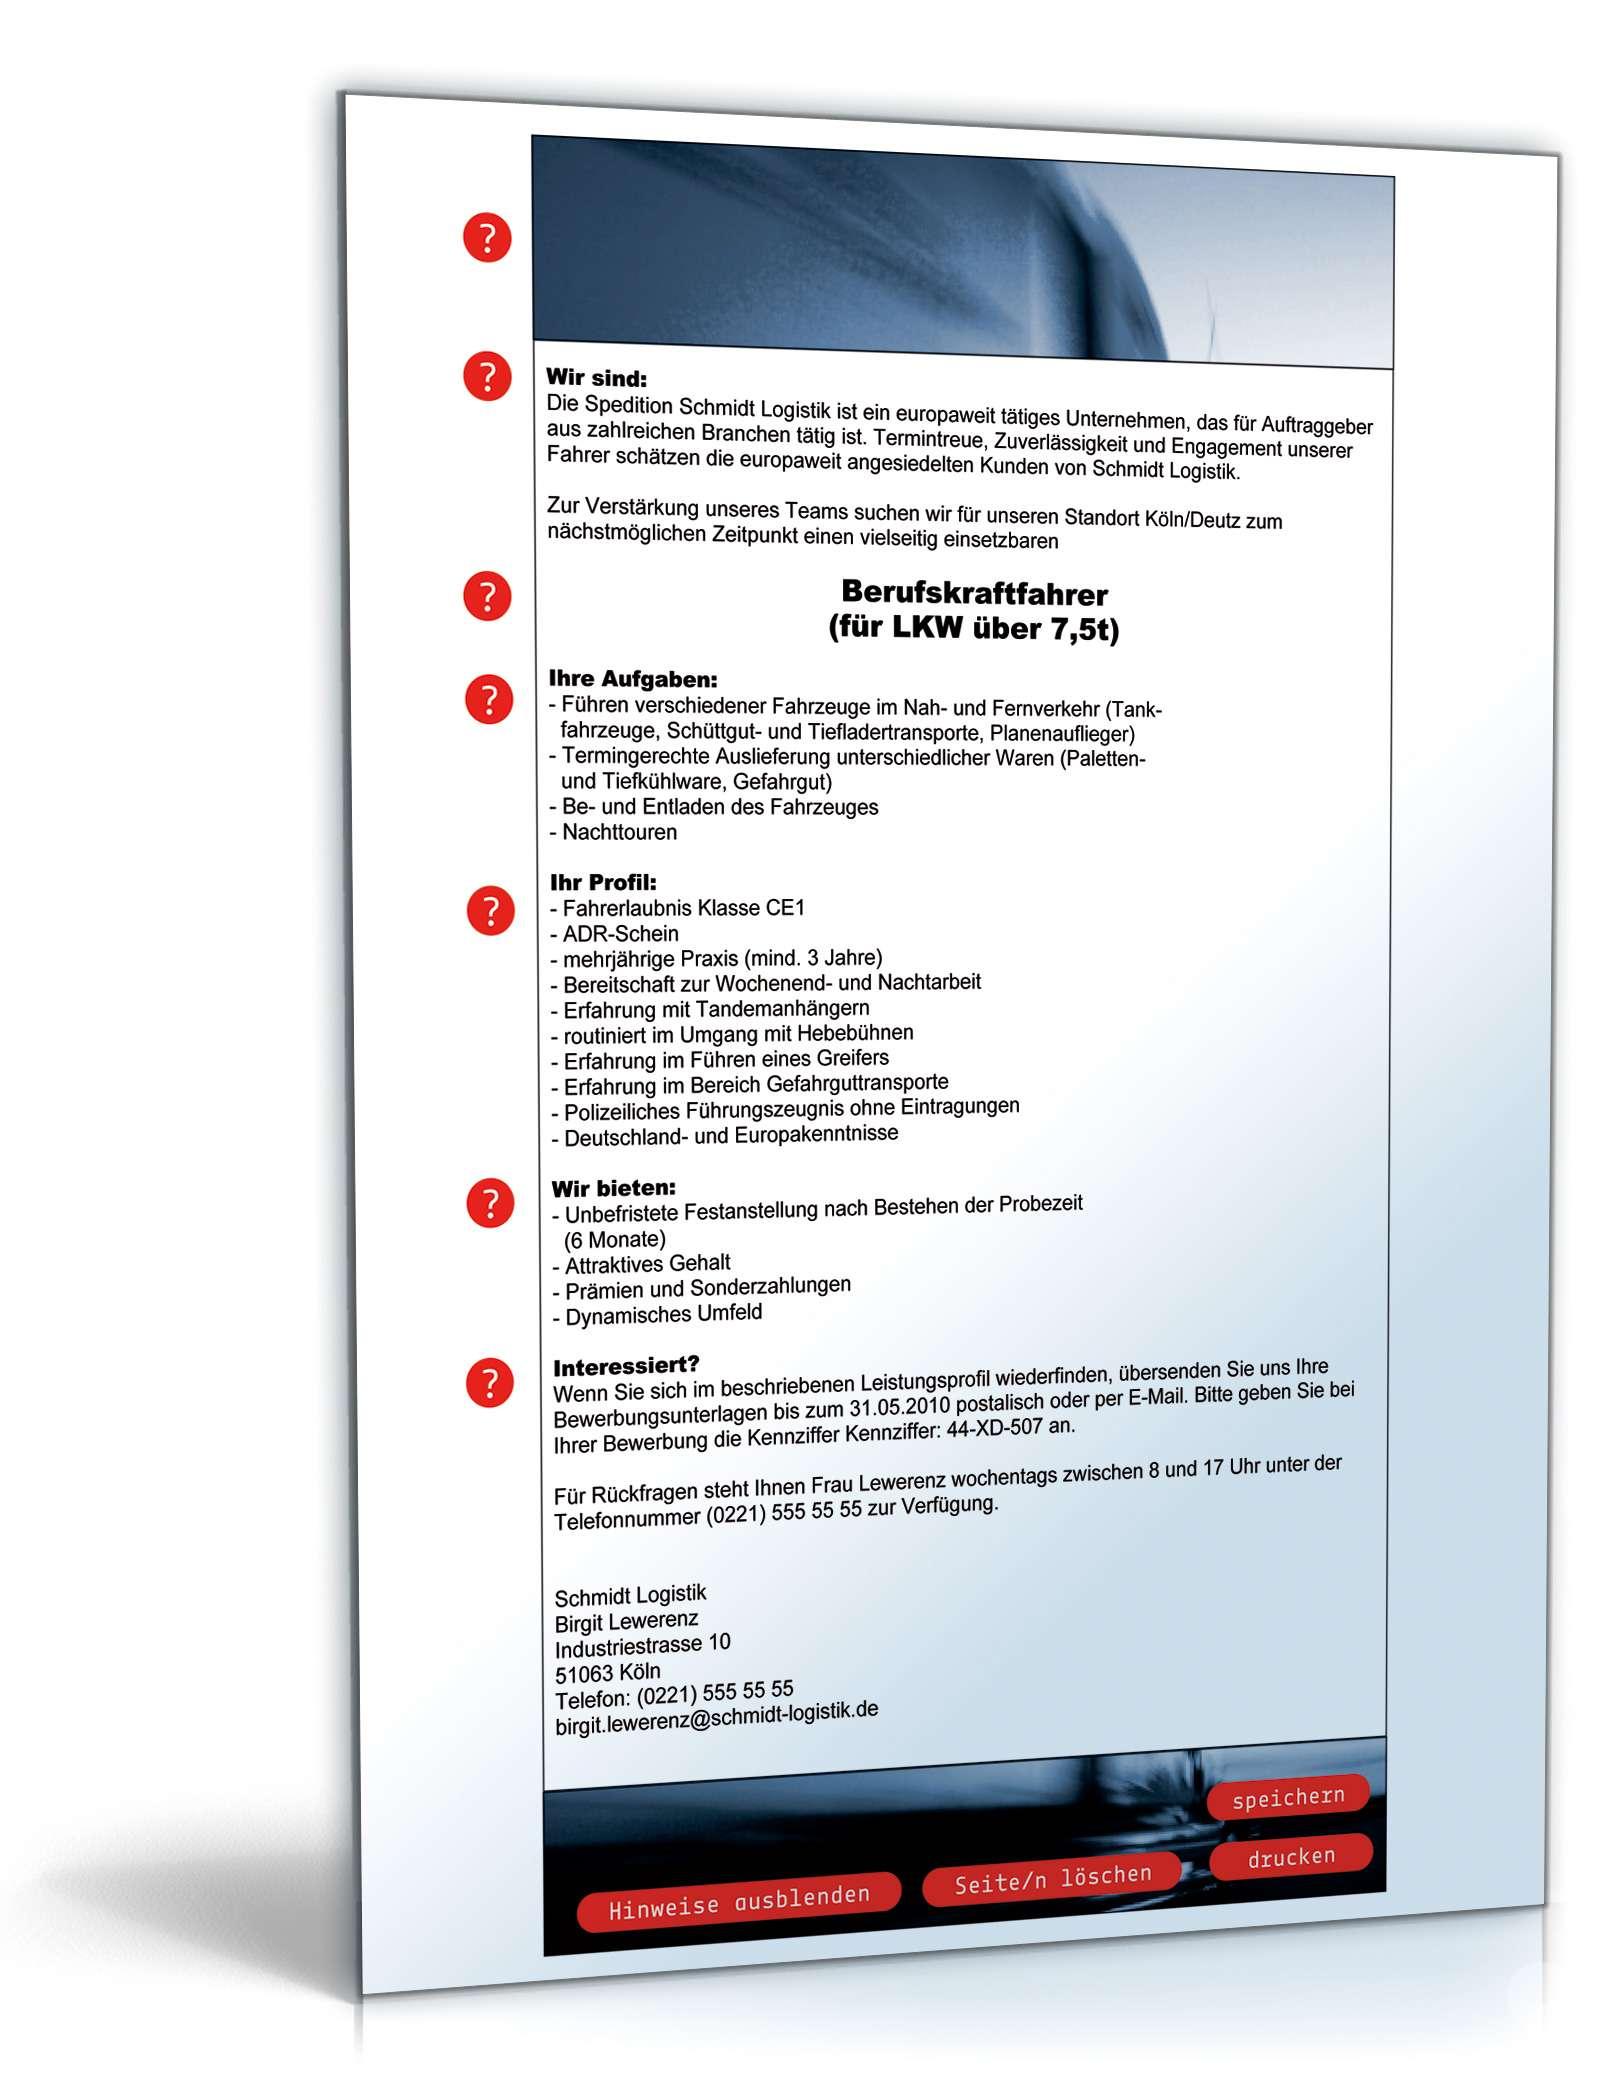 Stellenausschreibung Berufskraftfahrer Muster Zum Download